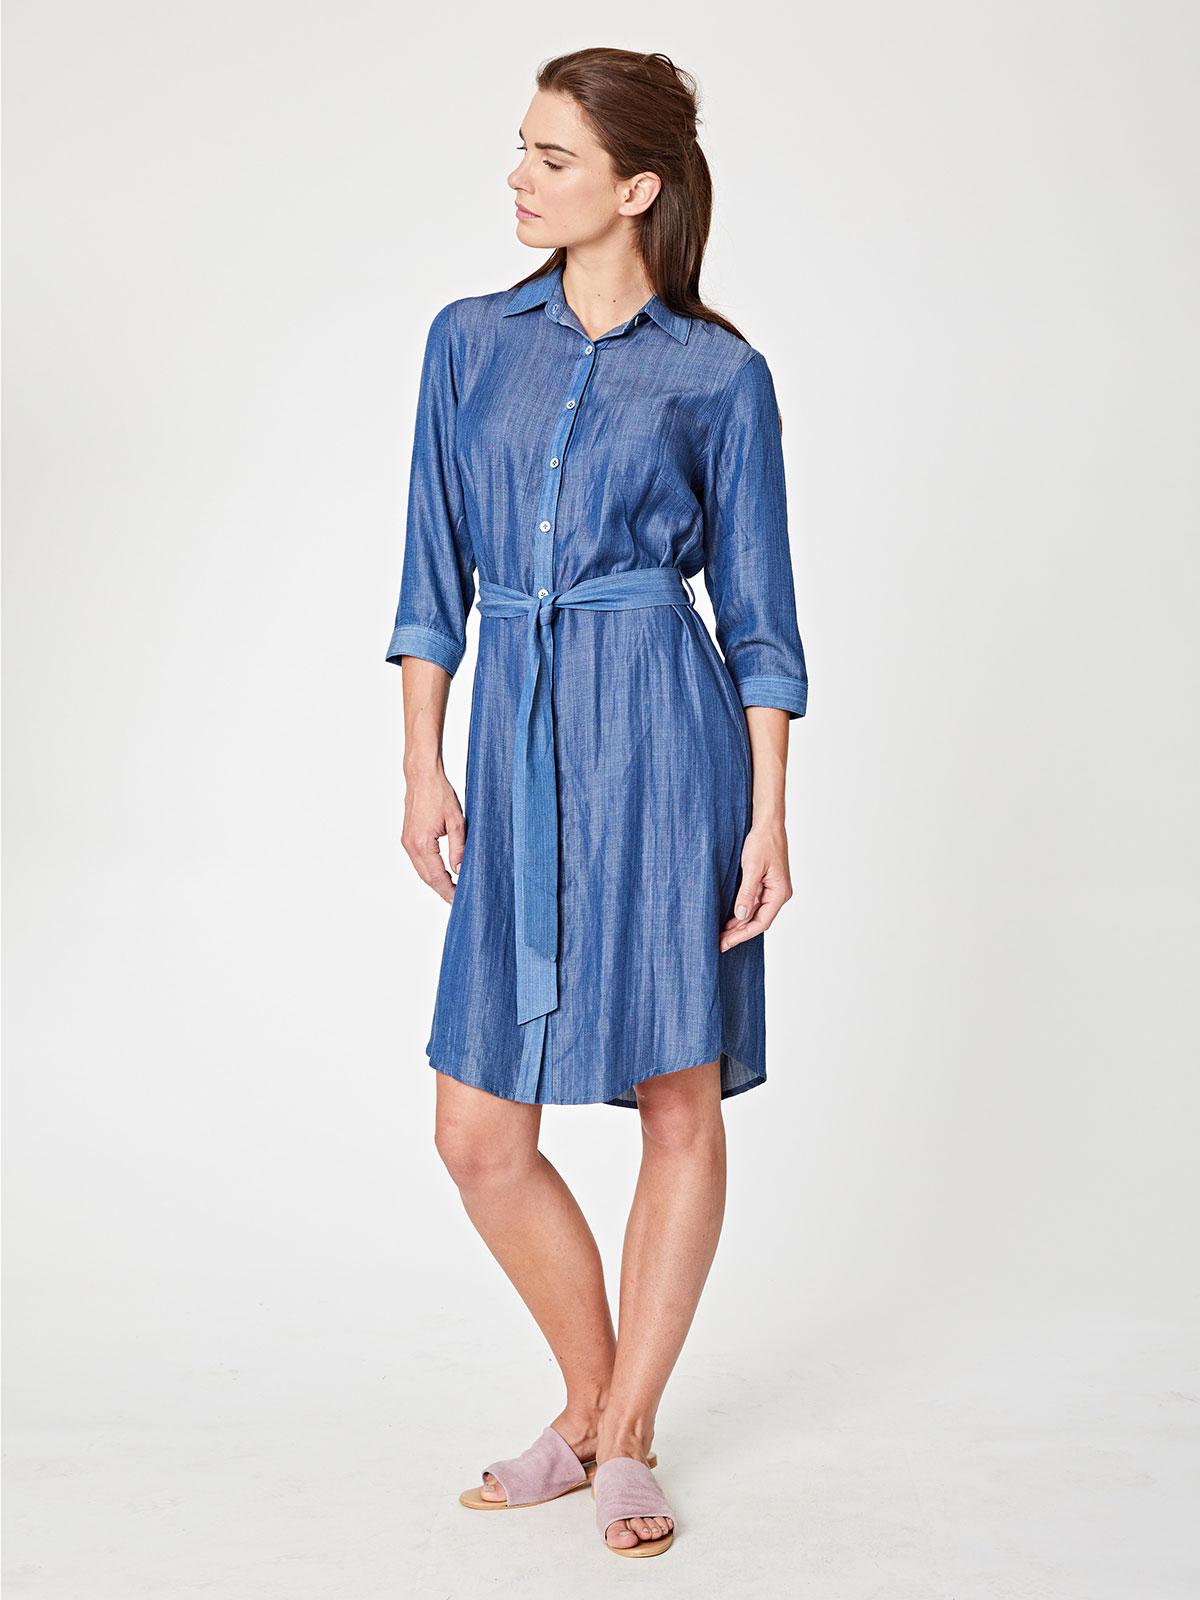 d282e0784b8 Meena Chambray Shirt Dress (XL) — Bella Boutique ... Outlet für Eco ...